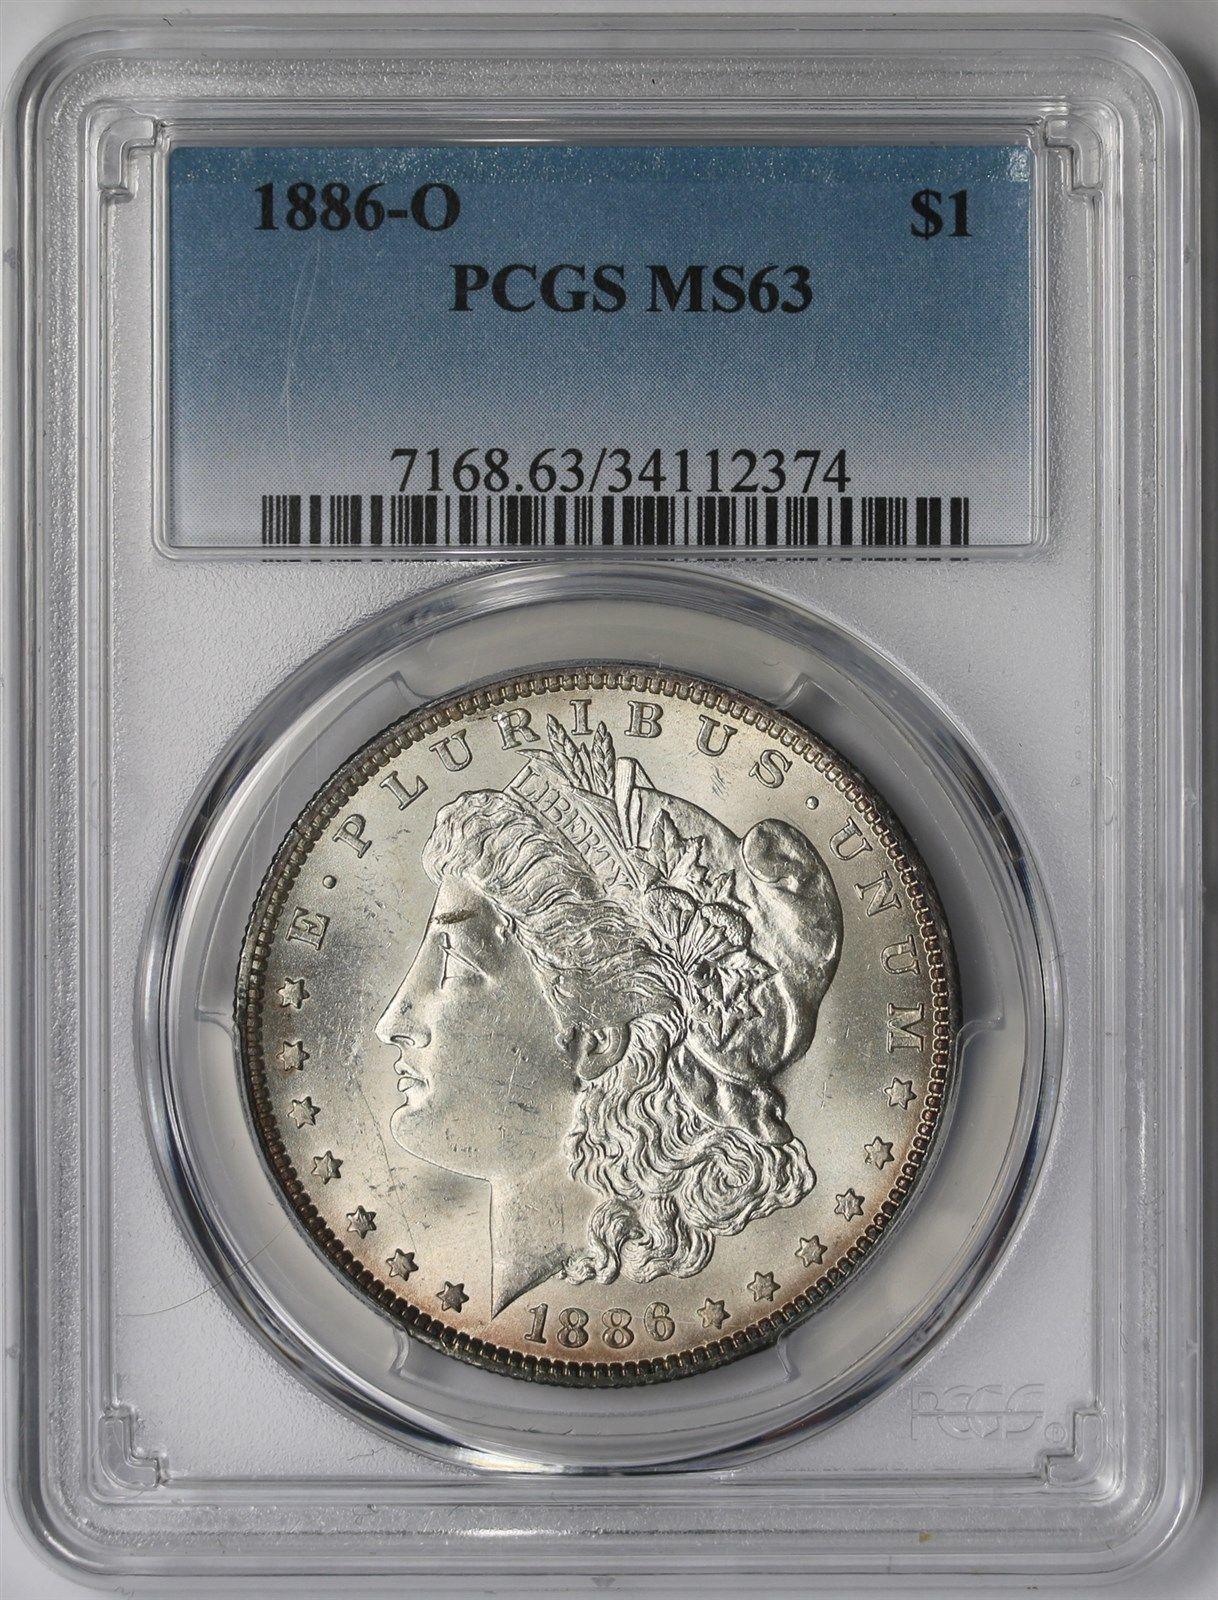 PCGS MS63 1886 US Morgan Silver Dollar $1